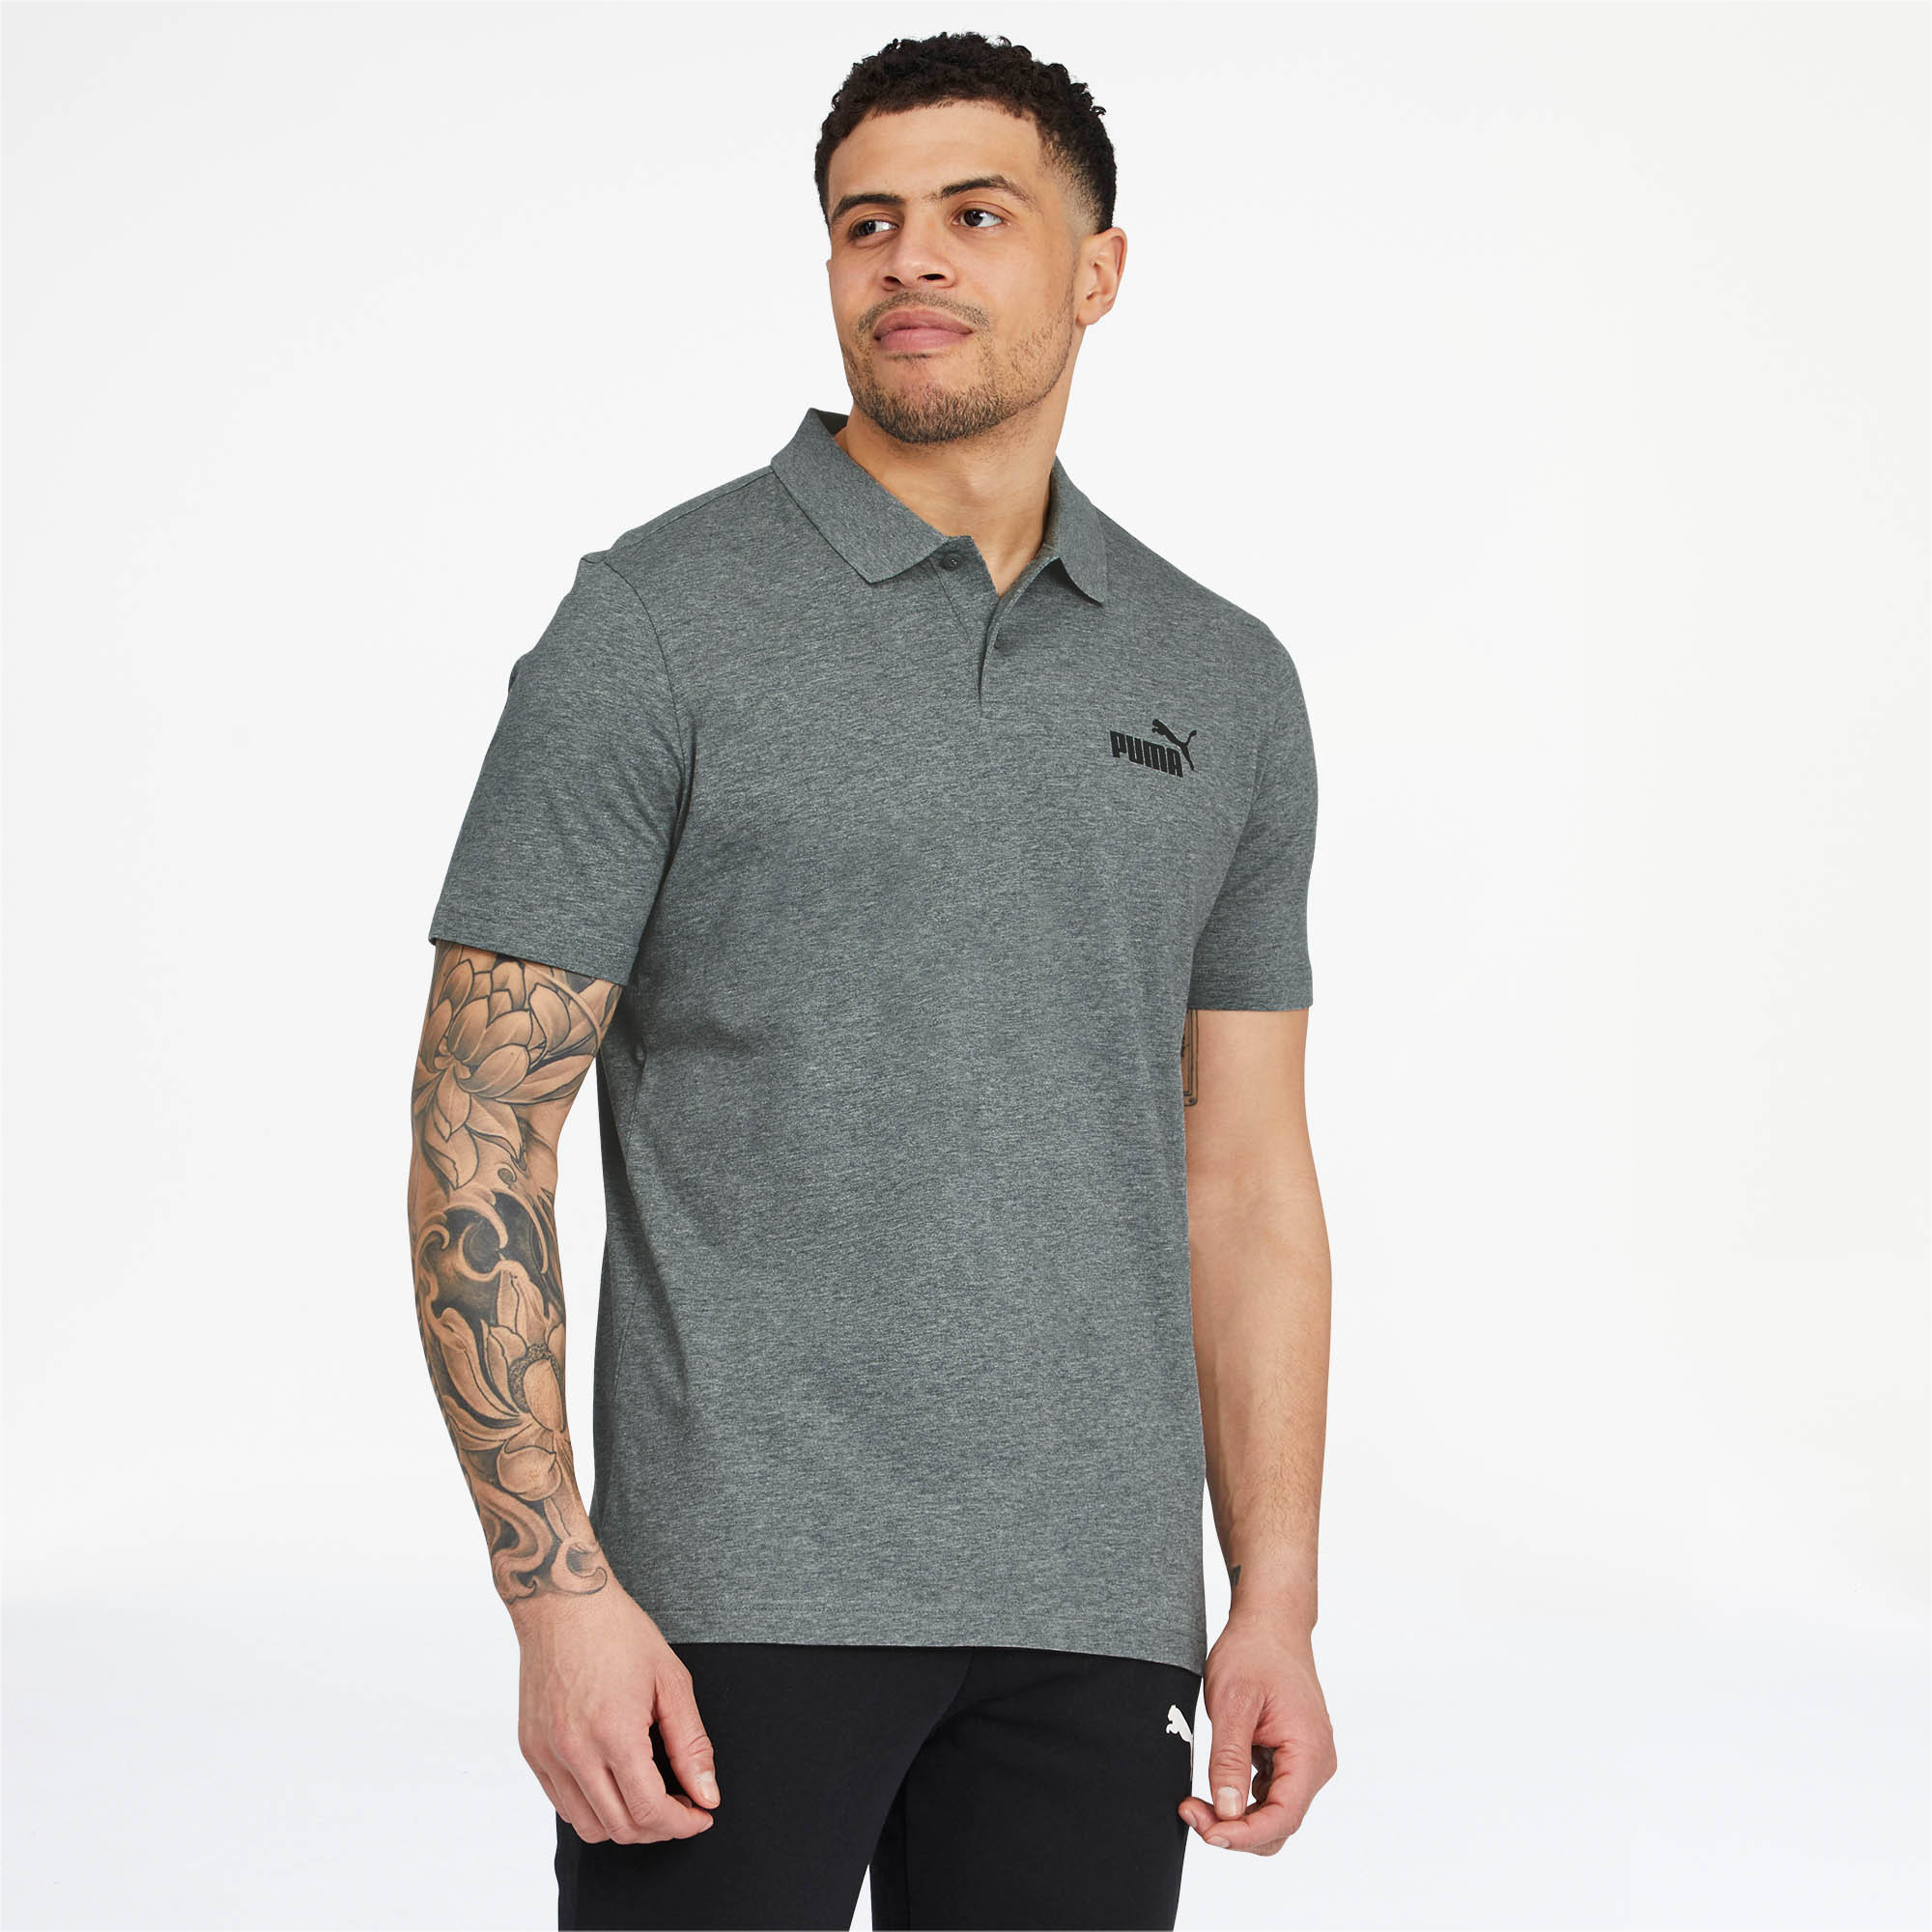 PUMA-Essentials-Men-039-s-Jersey-Polo-Men-Polo-Basics thumbnail 7